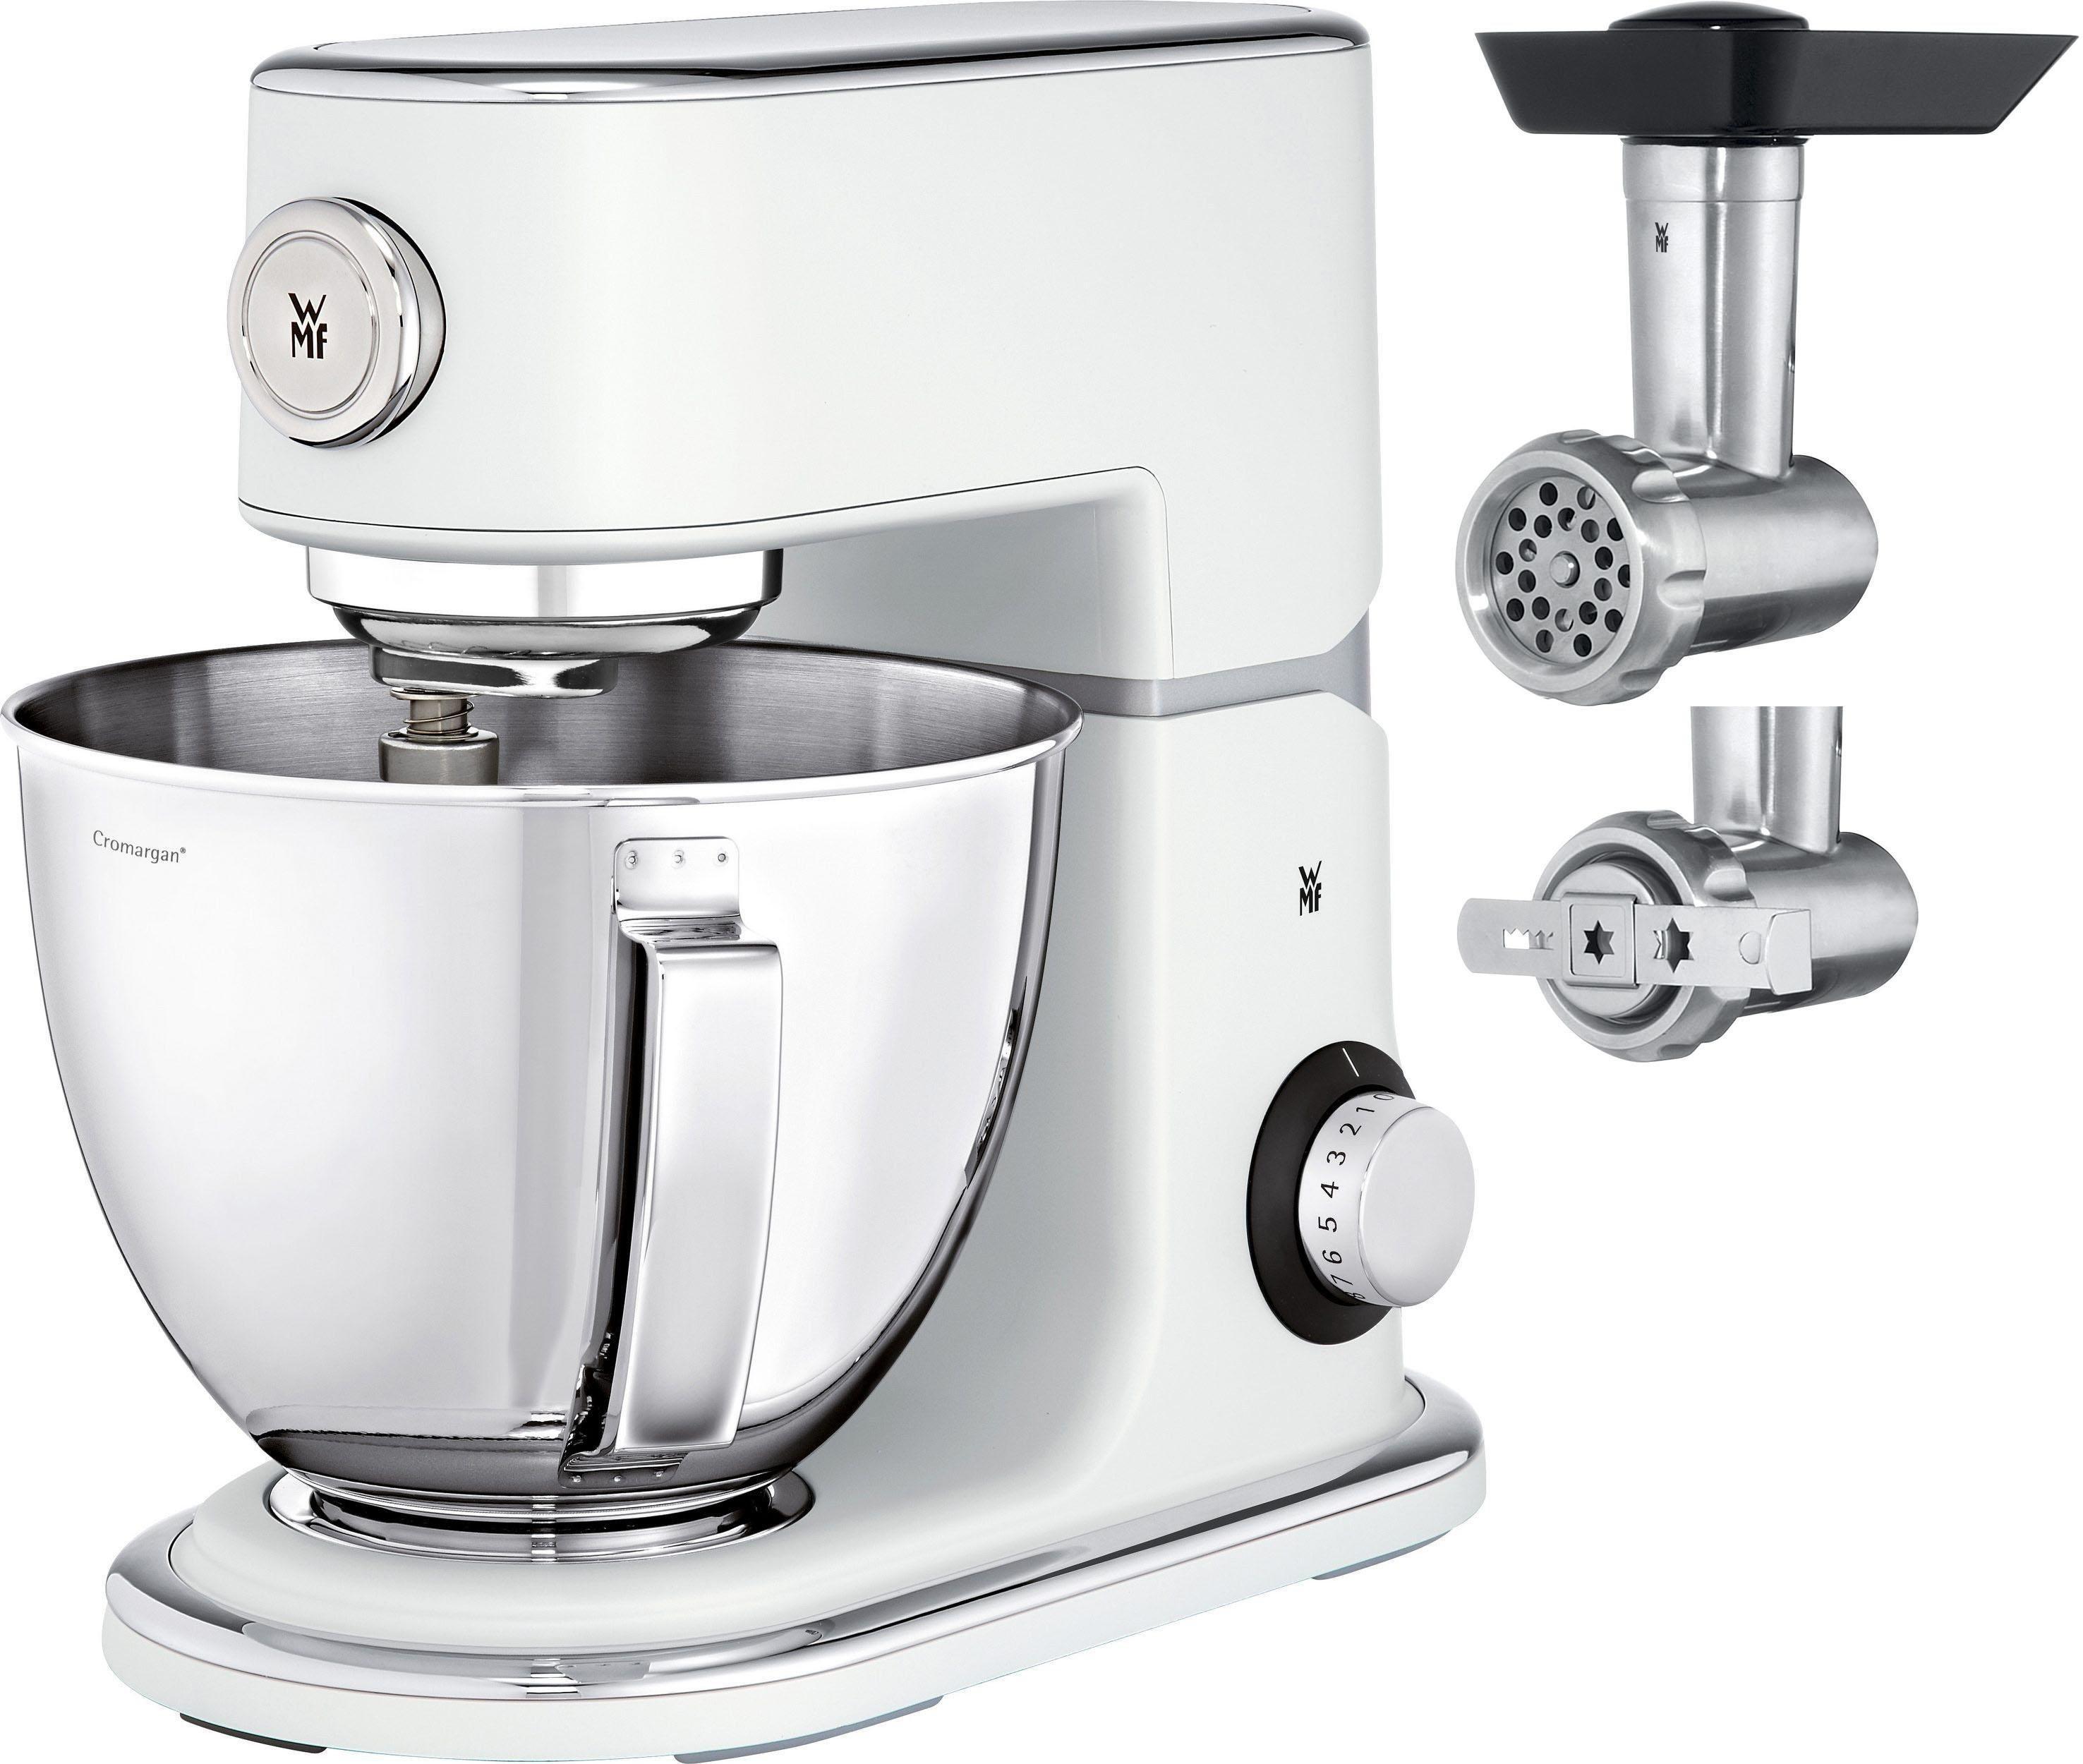 Großzügig Küchengerät Bündel Zeitgenössisch - Küche Set Ideen ...